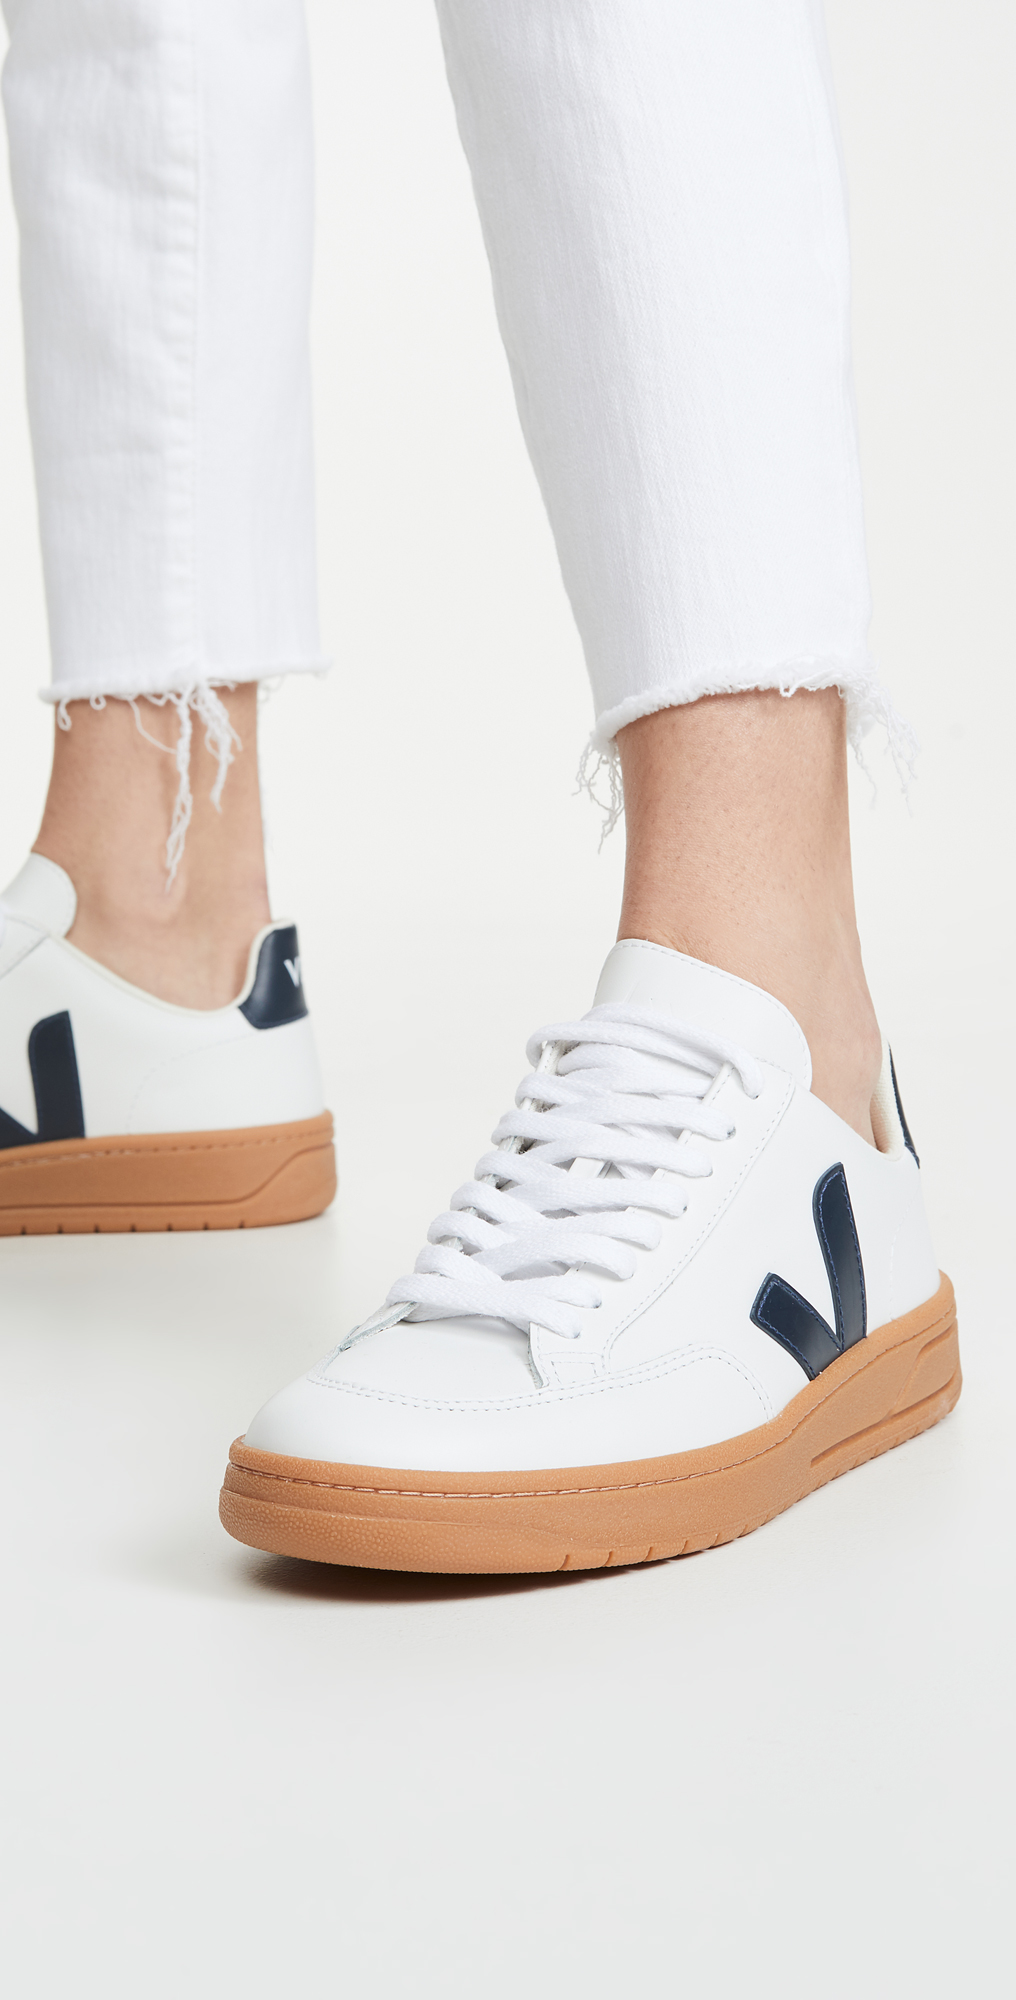 white sneakers gum sole